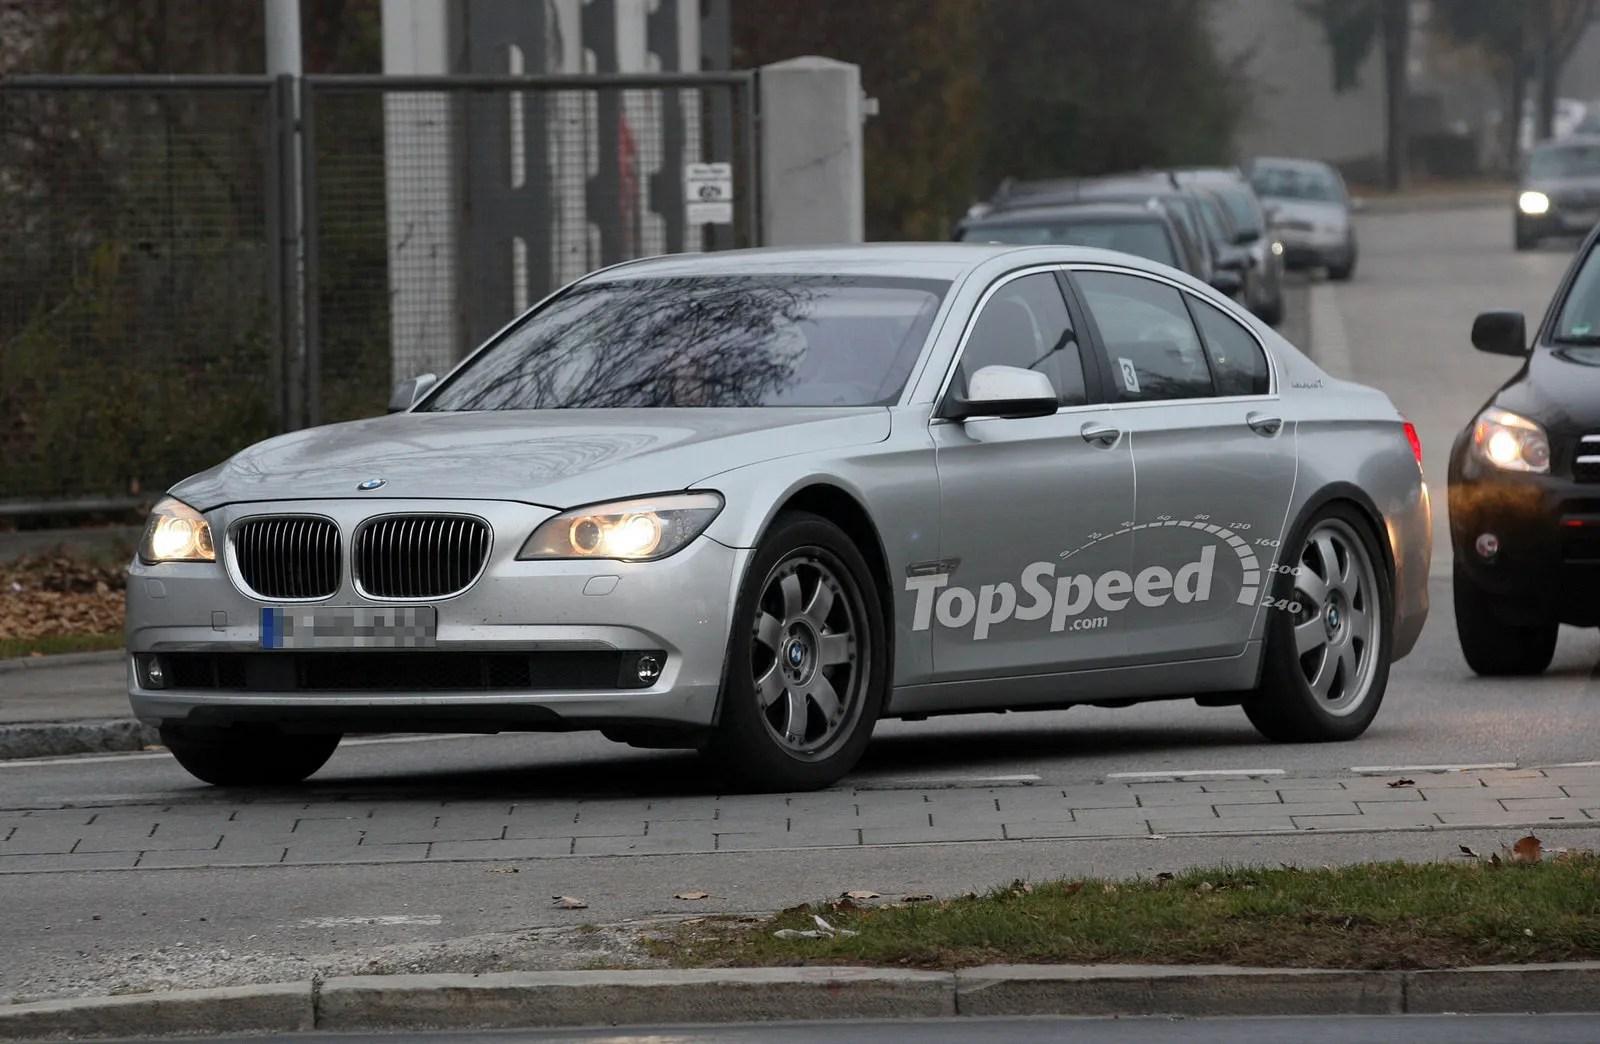 2015 Bmw I5 Sedan Top Speed